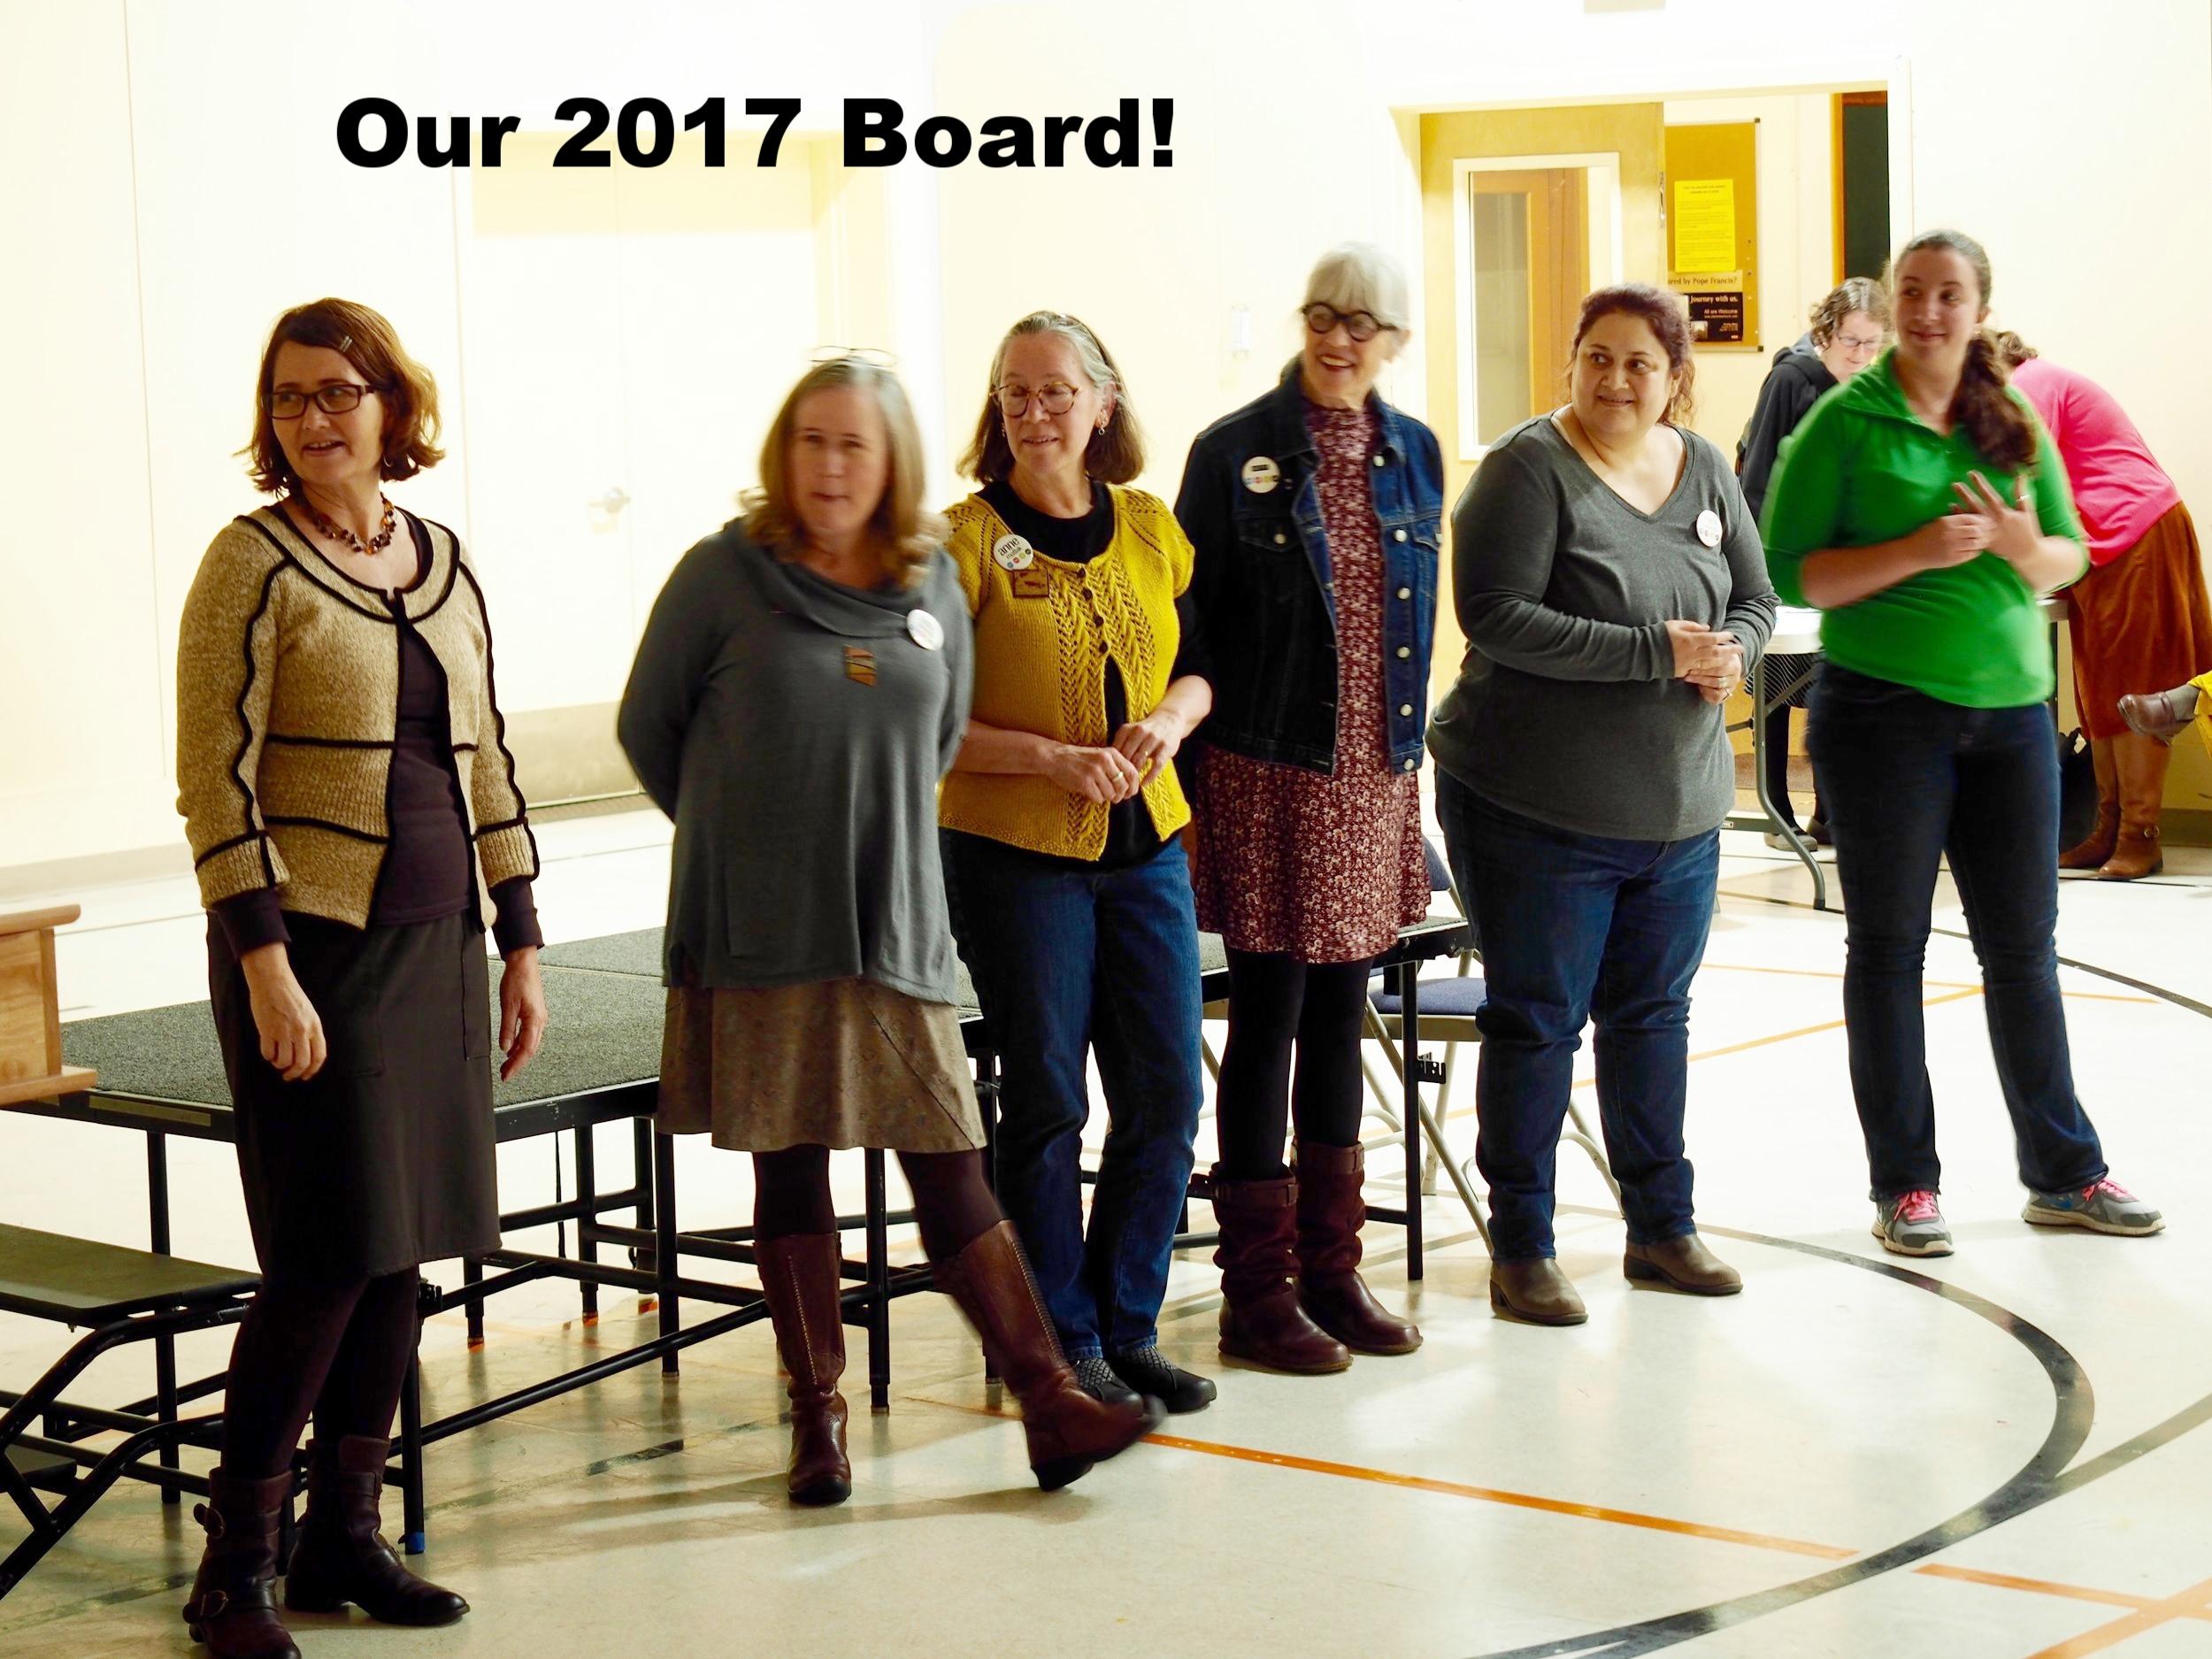 President-Tamara King  Vice President-Tania Johnston  Secretary- Anne Matlak  Treasurer- Betty Colburn  Programs- Maria Cardenas & Nicole Howe